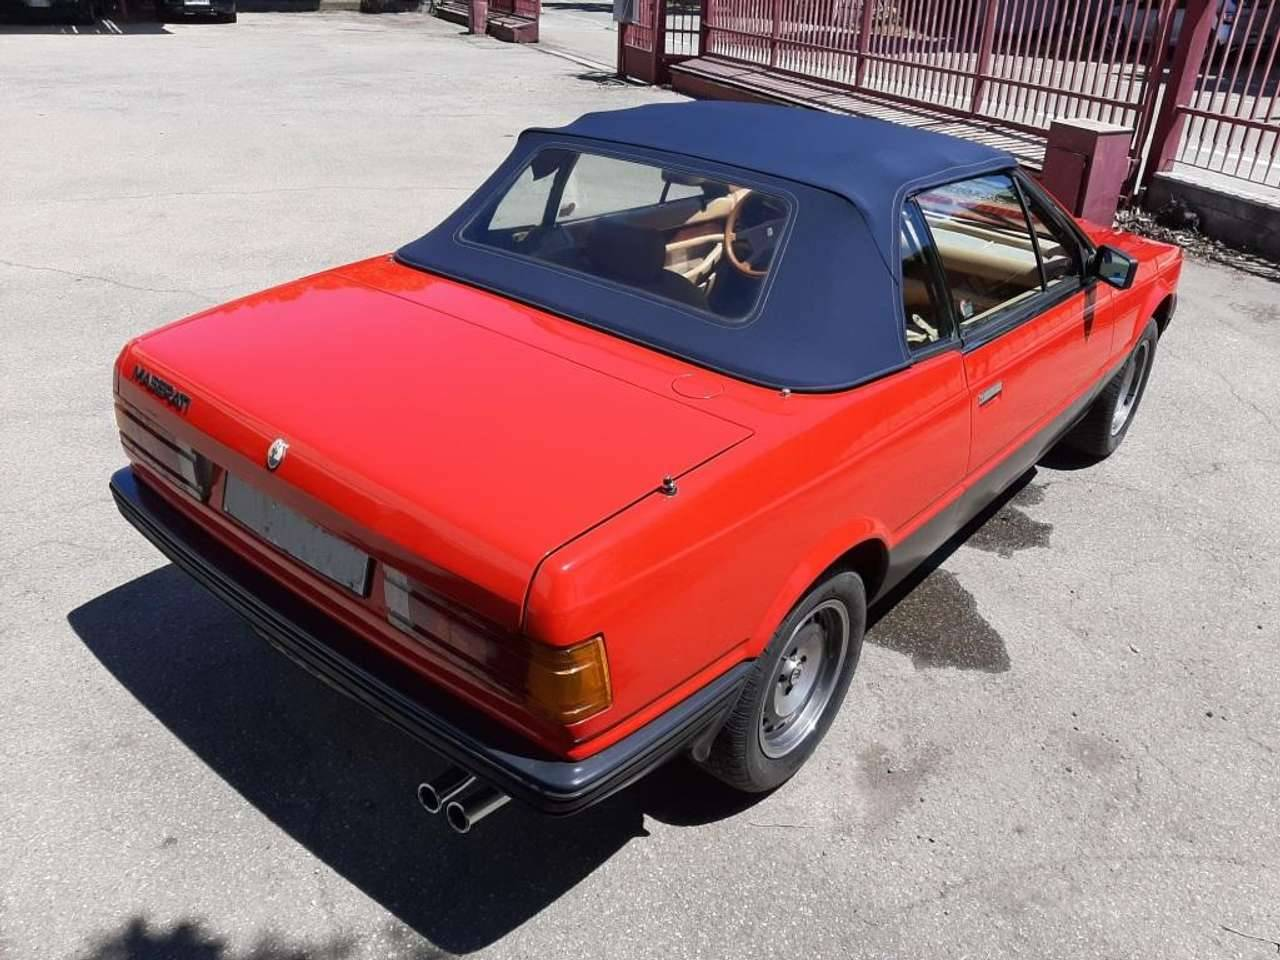 For Sale: Maserati Biturbo Spyder (1985) offered for AUD 41,388